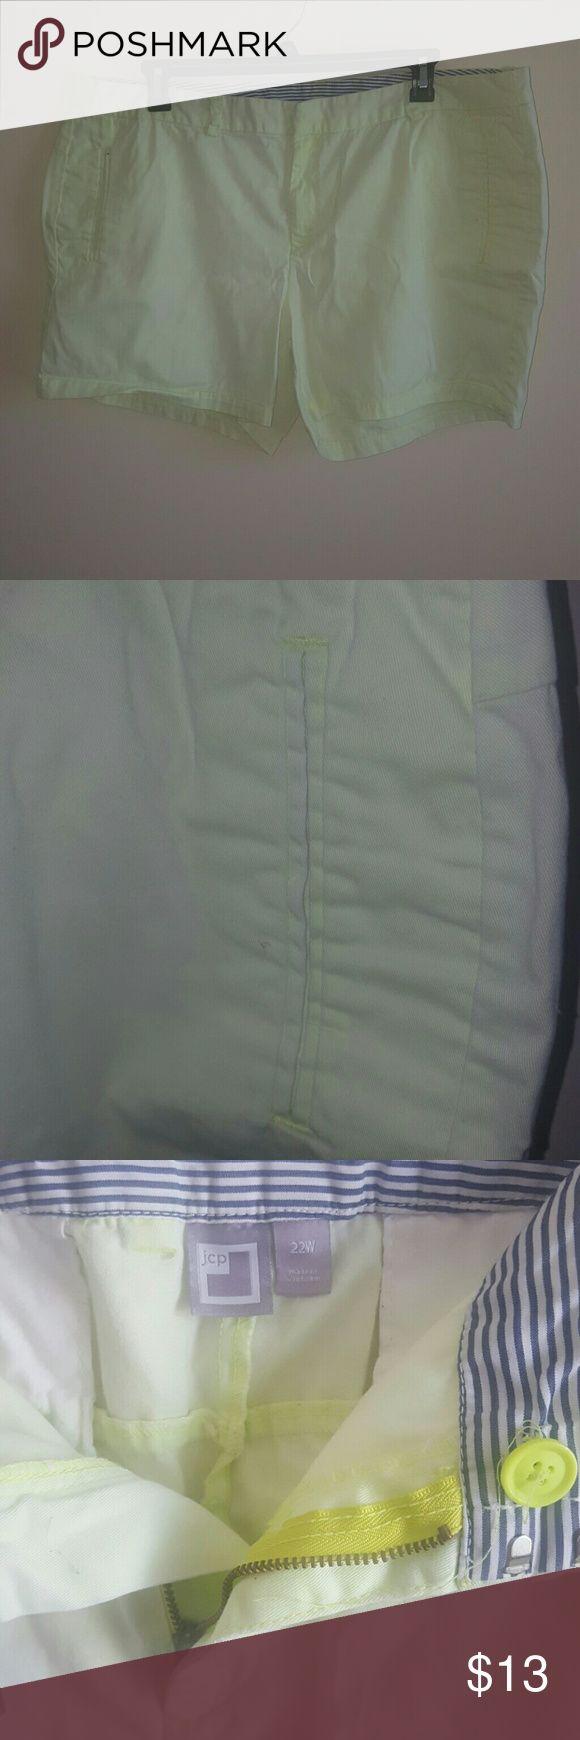 Lime Green Shorts 8inch stylish shorts jcpenney Shorts